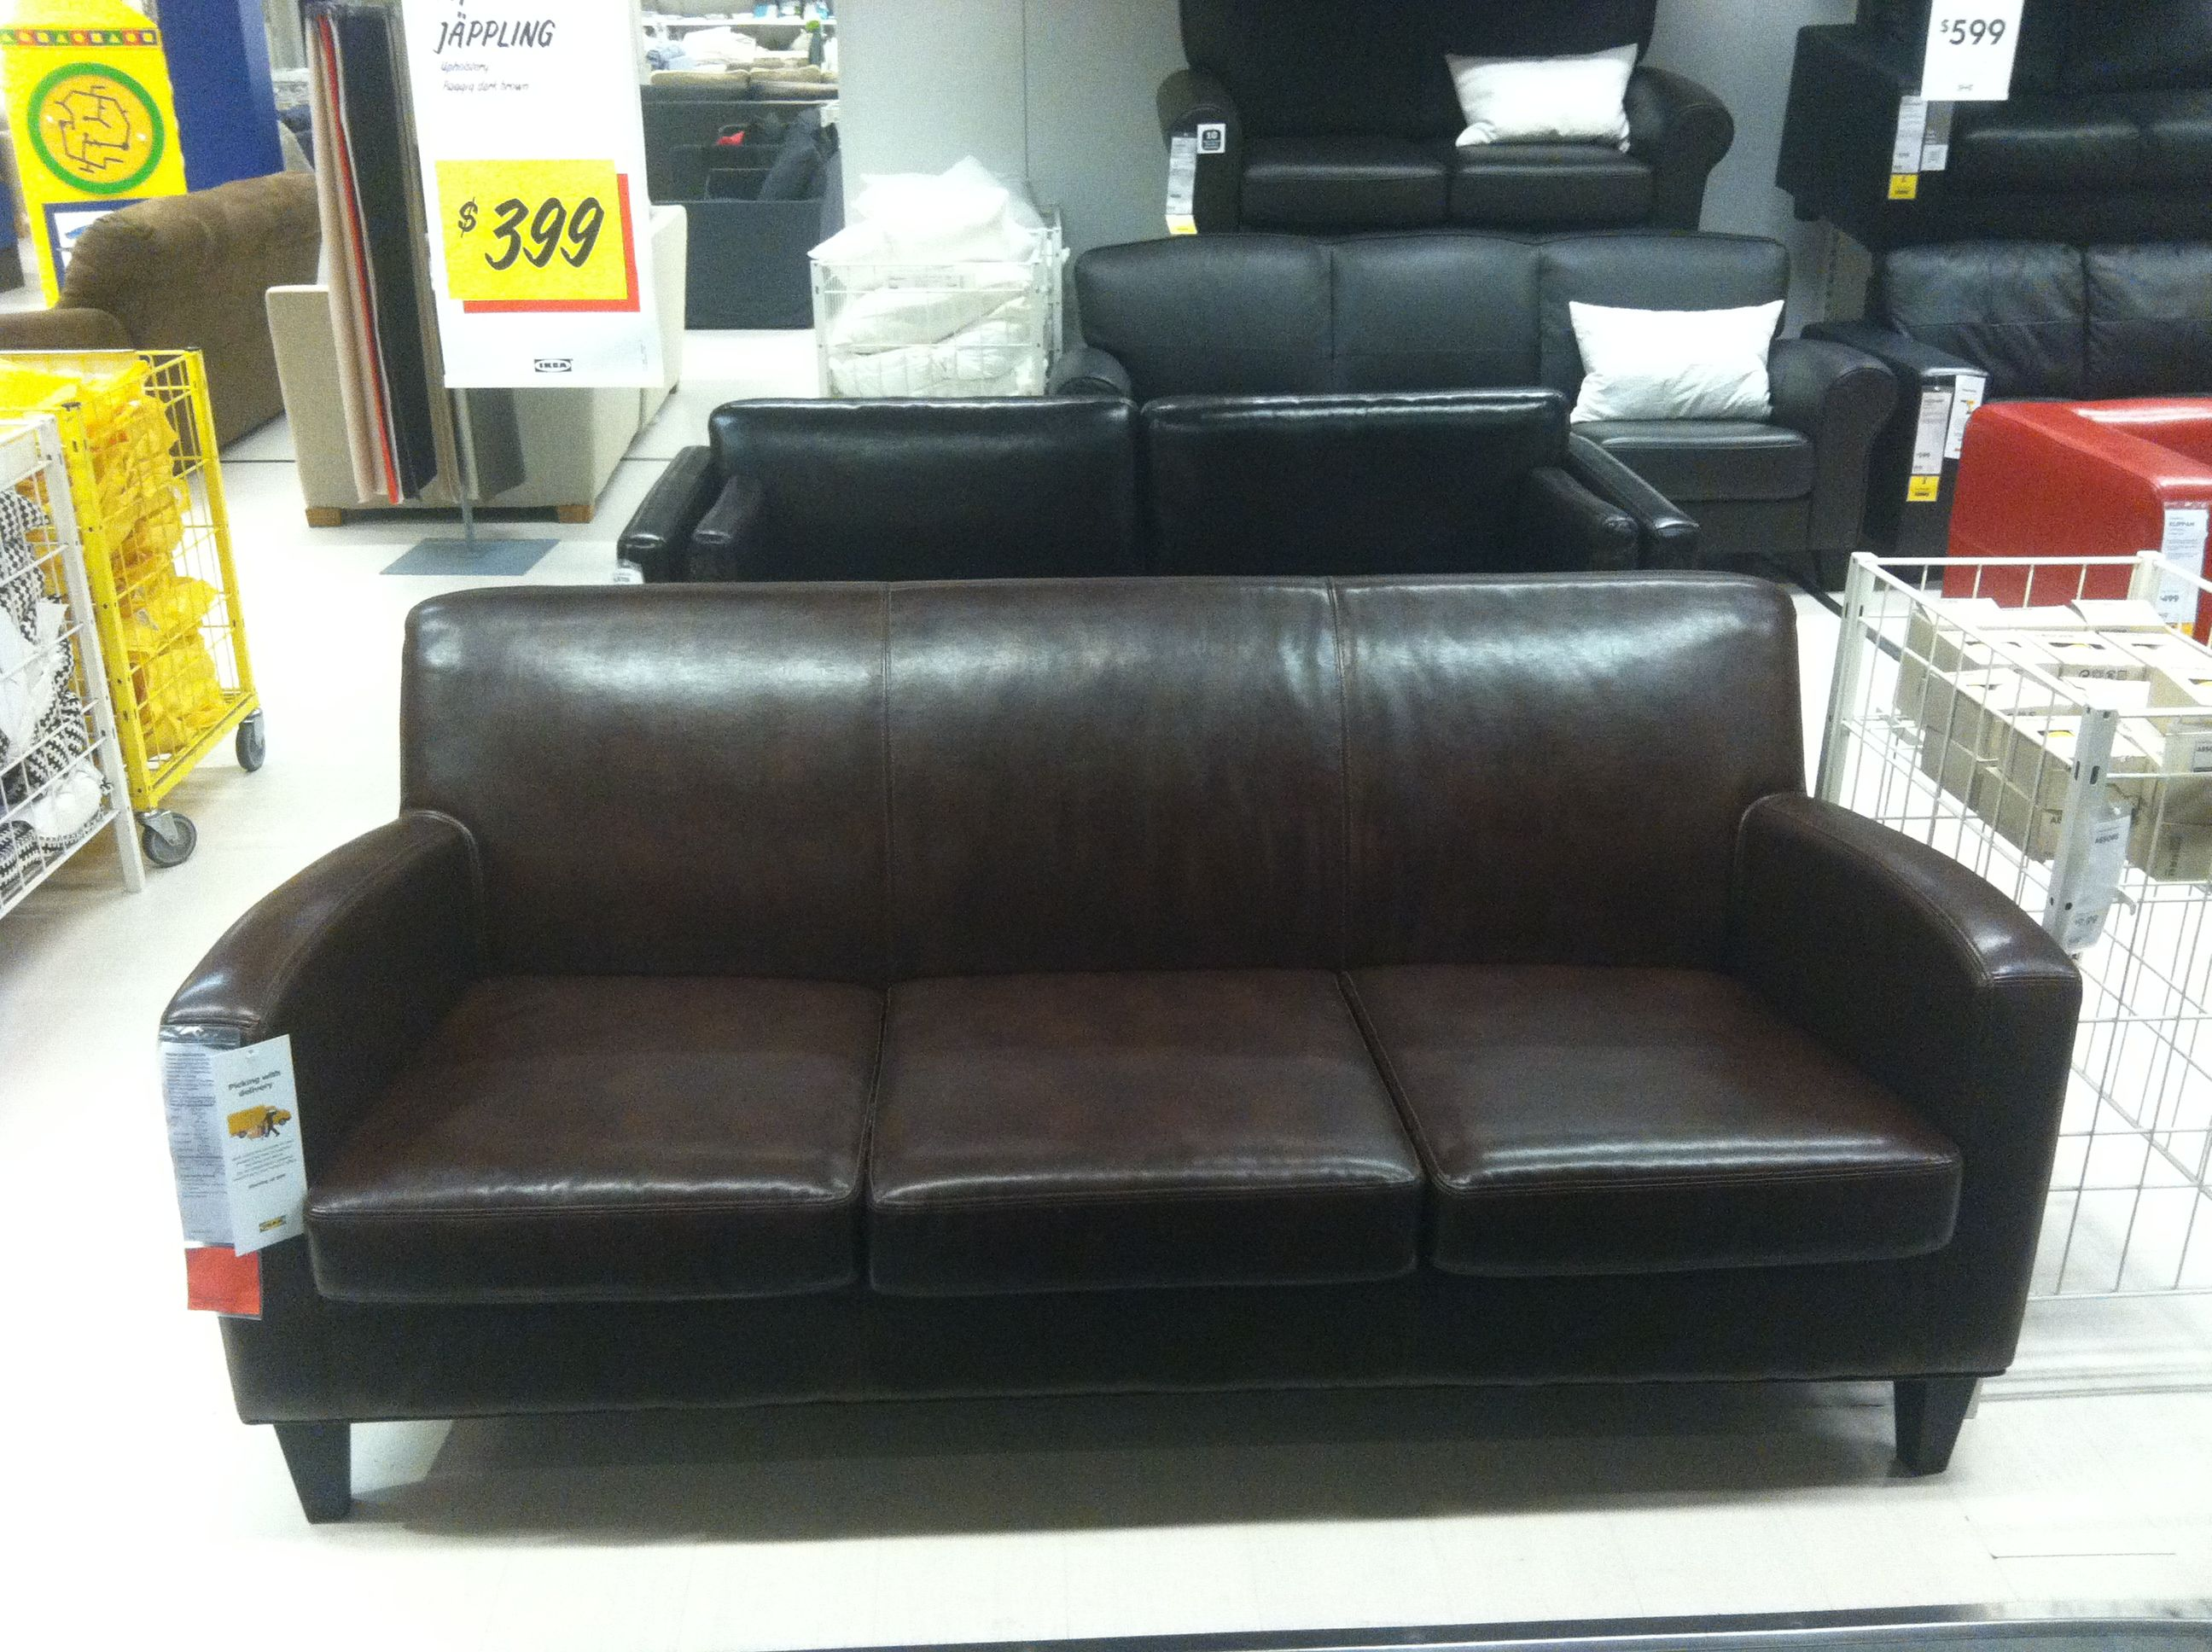 Crate And Barrel Davis Sofa Slipcover Student Discount Jappling Ikea 399 Basement Pinterest Basements